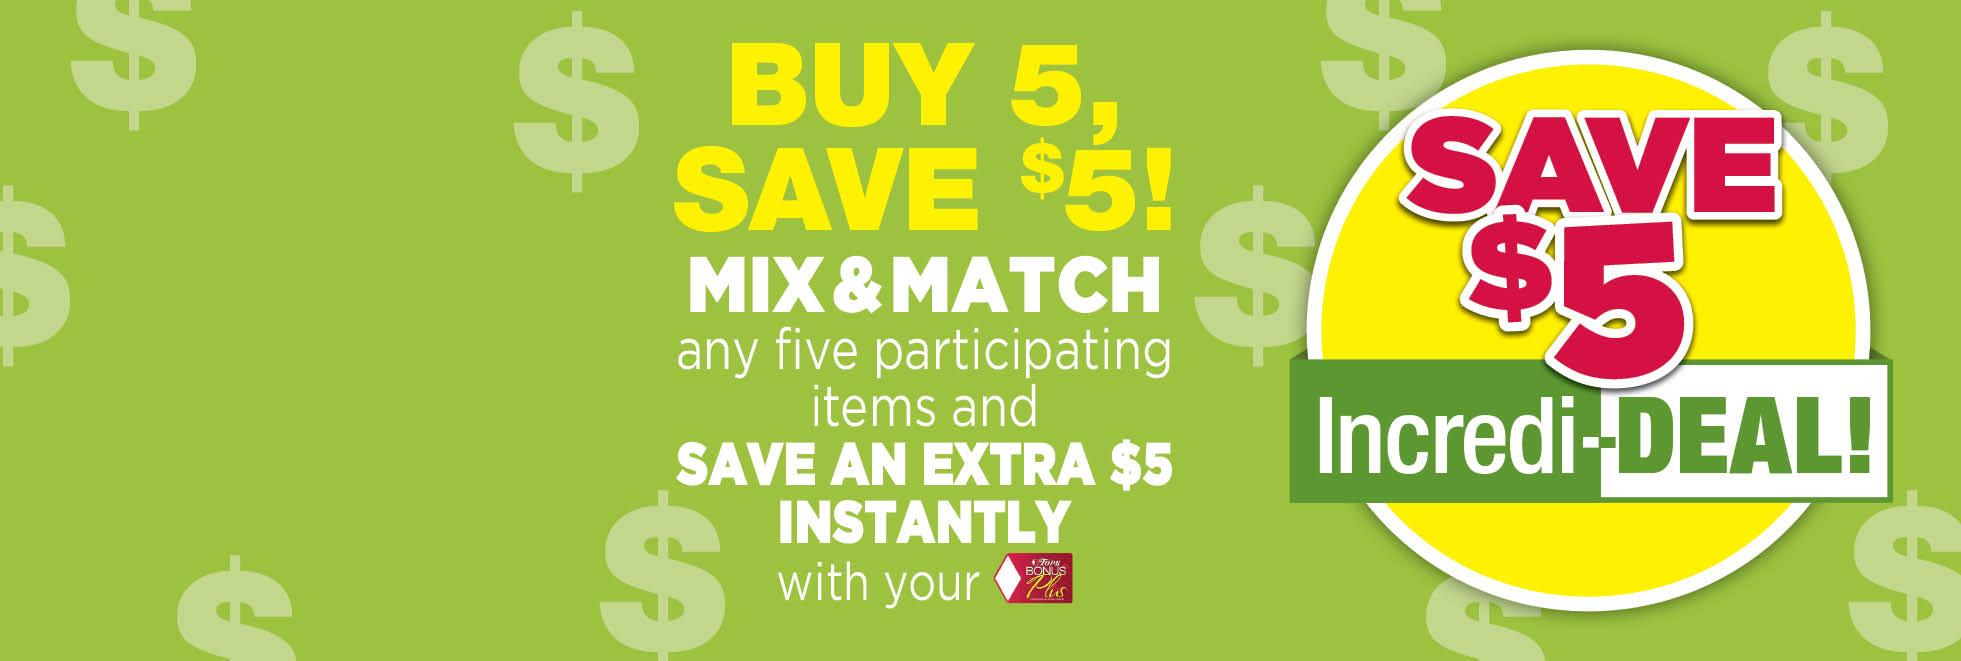 Buy 5, Save $5